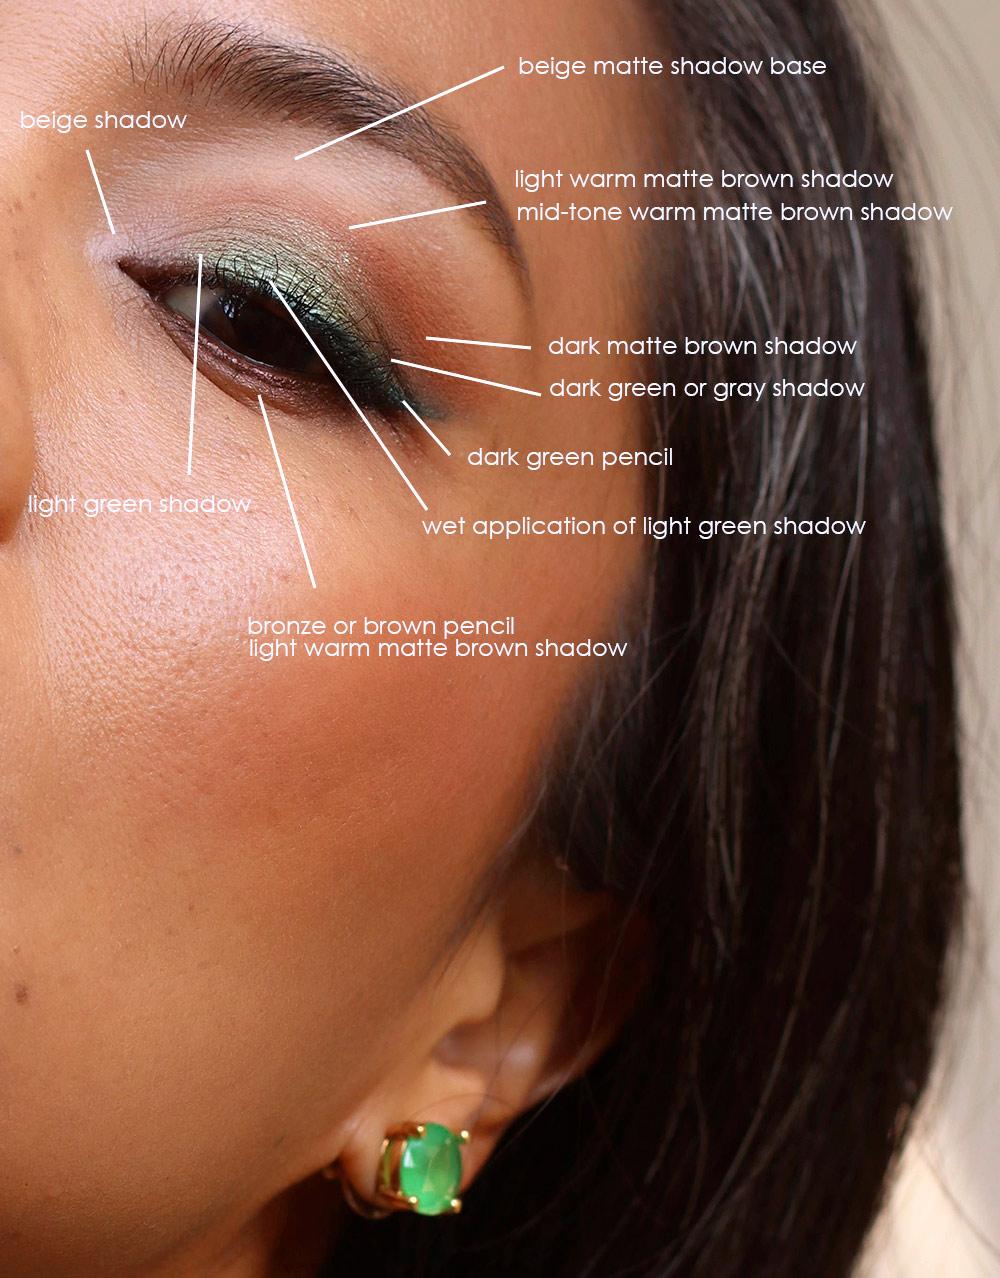 urban decay loaded liner mildew eyeshadow eyeshadow-layout 2